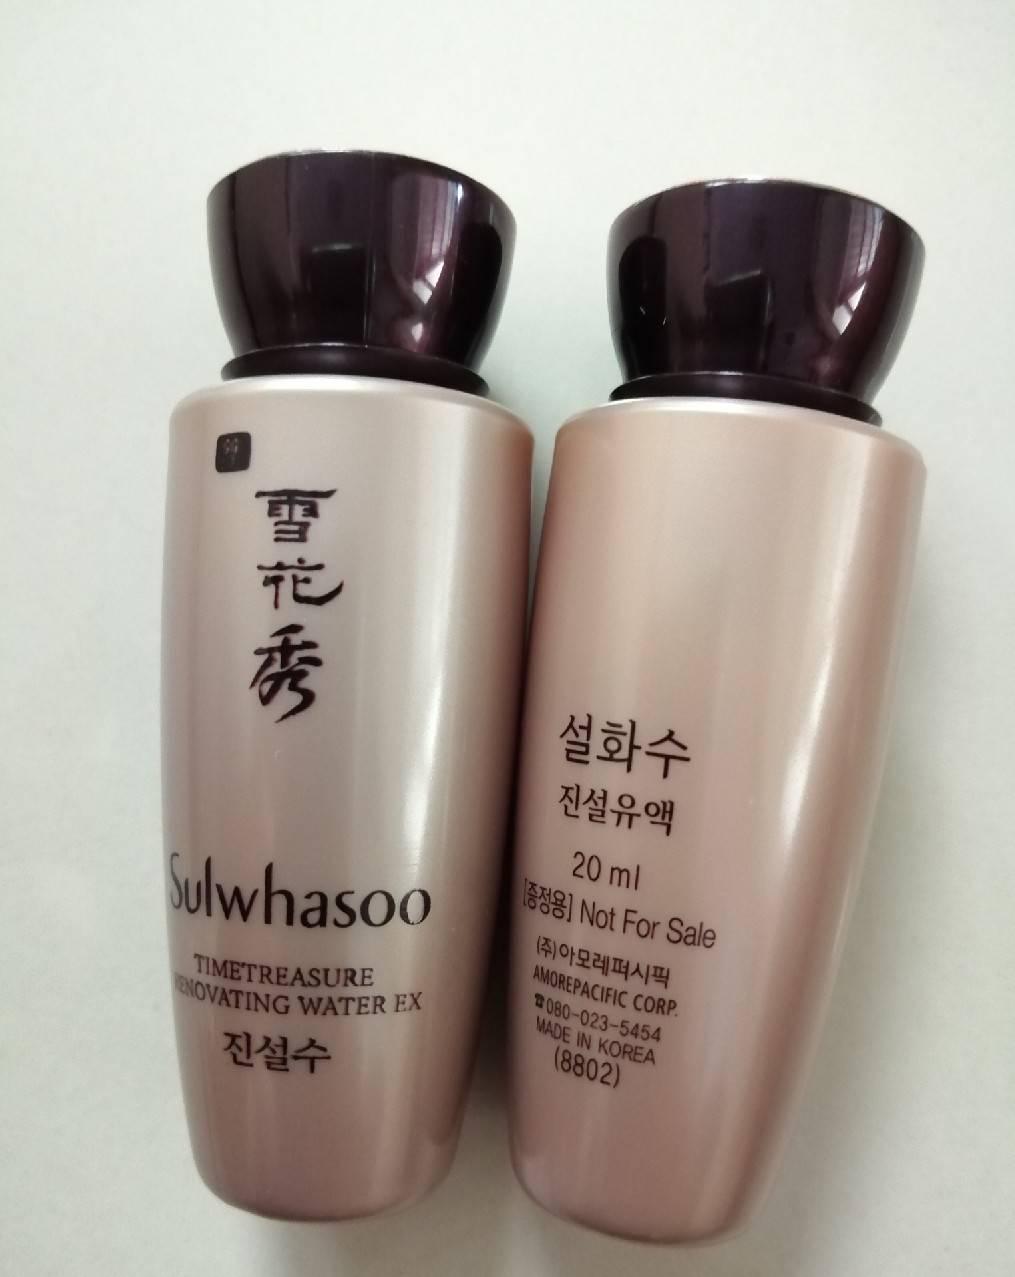 Sulwhasoo Timetreasure Renovating Emulsion EX  Water EX กล่องนึงมี 2 item(ของแท้ขนาดทดลอง)